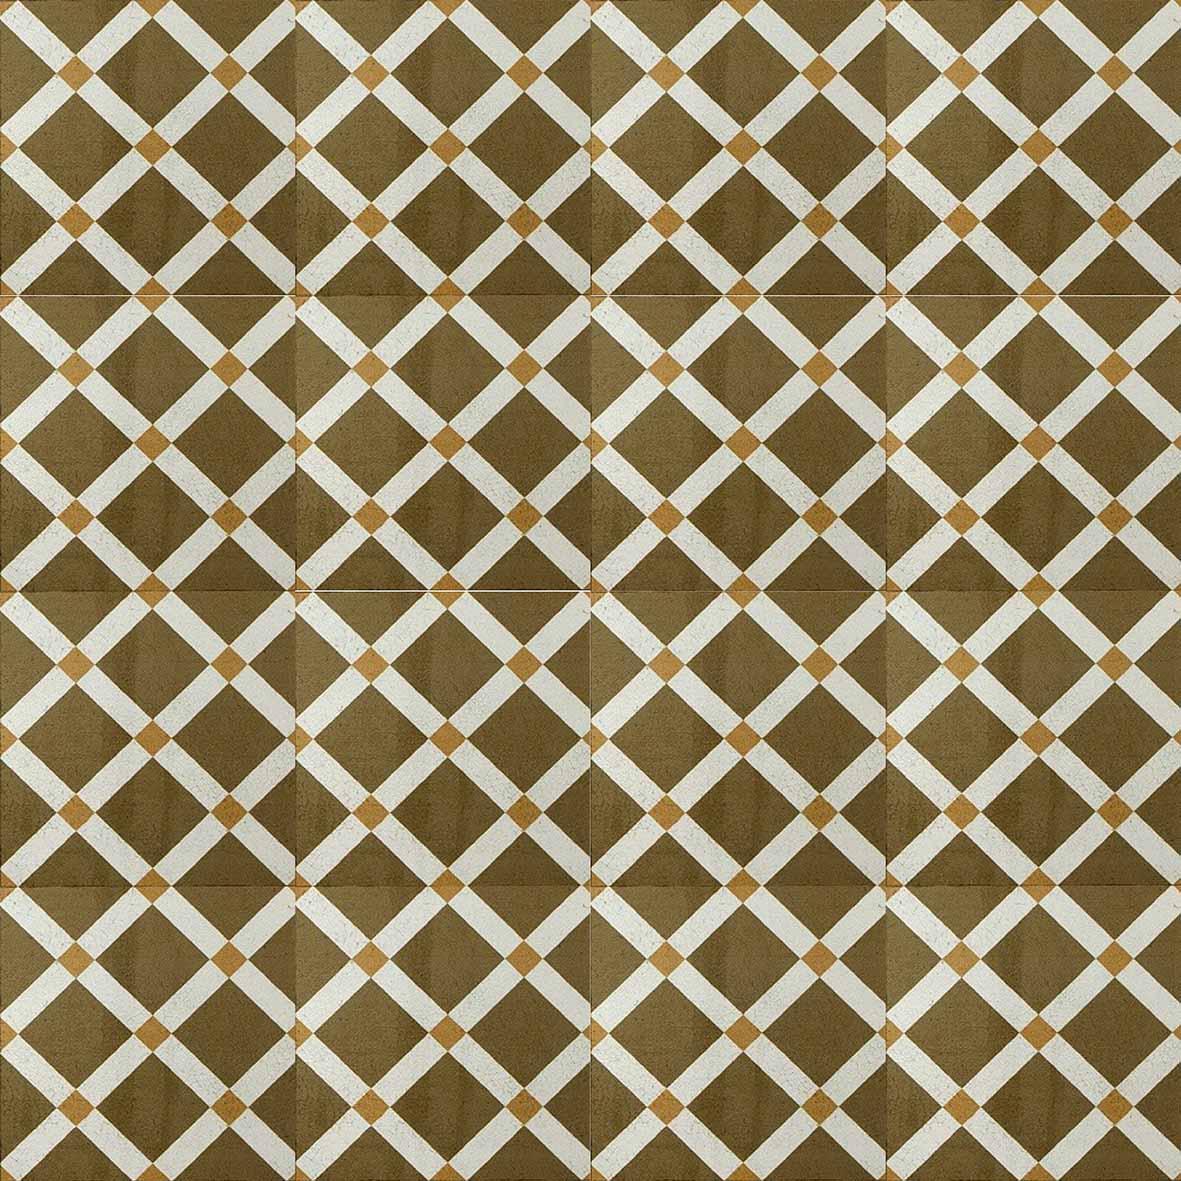 Adesivo para Azulejo Ladrilho Hidráulico Bilbao Vinil 15x15cm 16 peças Cosi Dimora